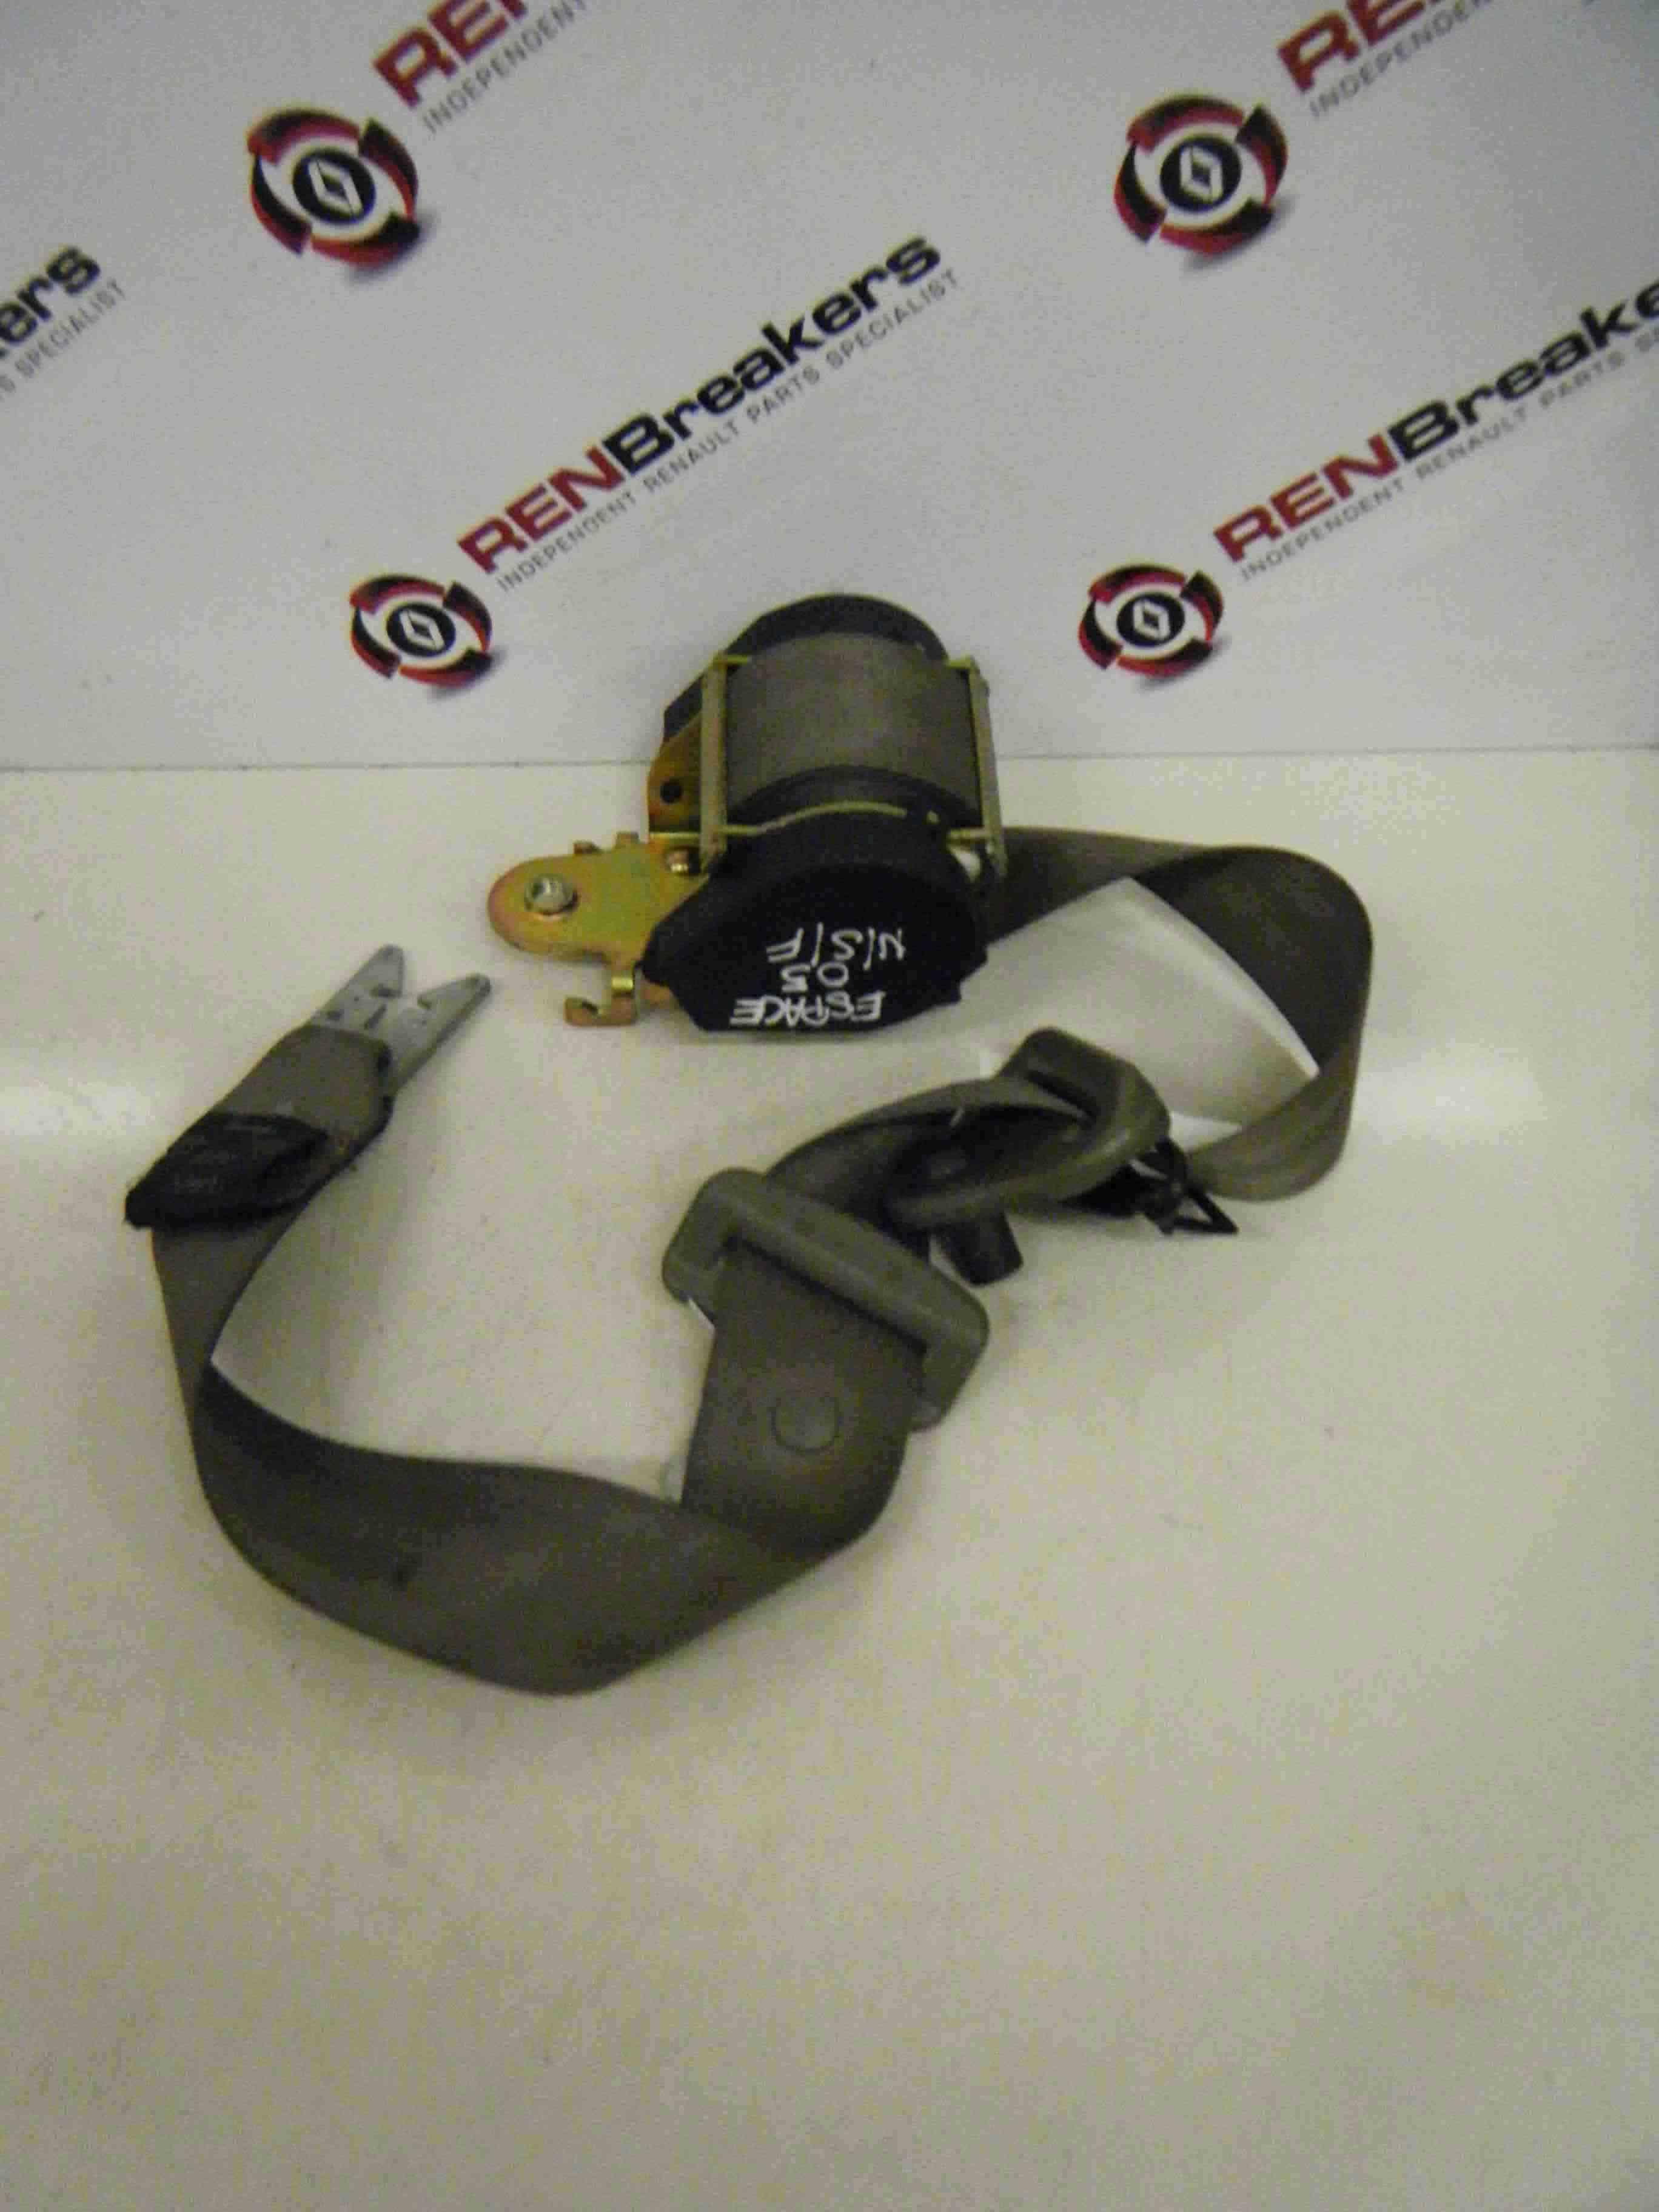 Renault Espace 2003-2013 Passenger NSF Front Seat Belt Light Grey Beige